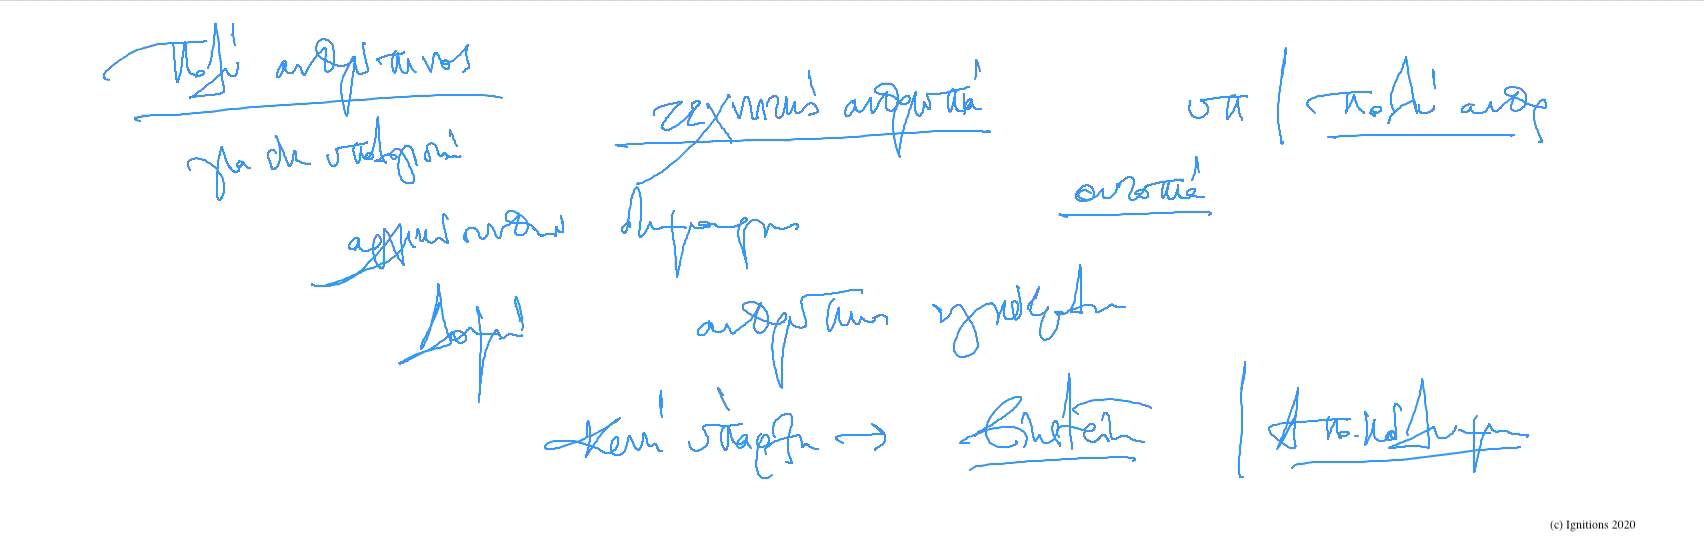 57519 - VIΙ - Το Έργο της Επιστημονικής Φαντασίας. Έργο ΧΙΙ. (Dessin)